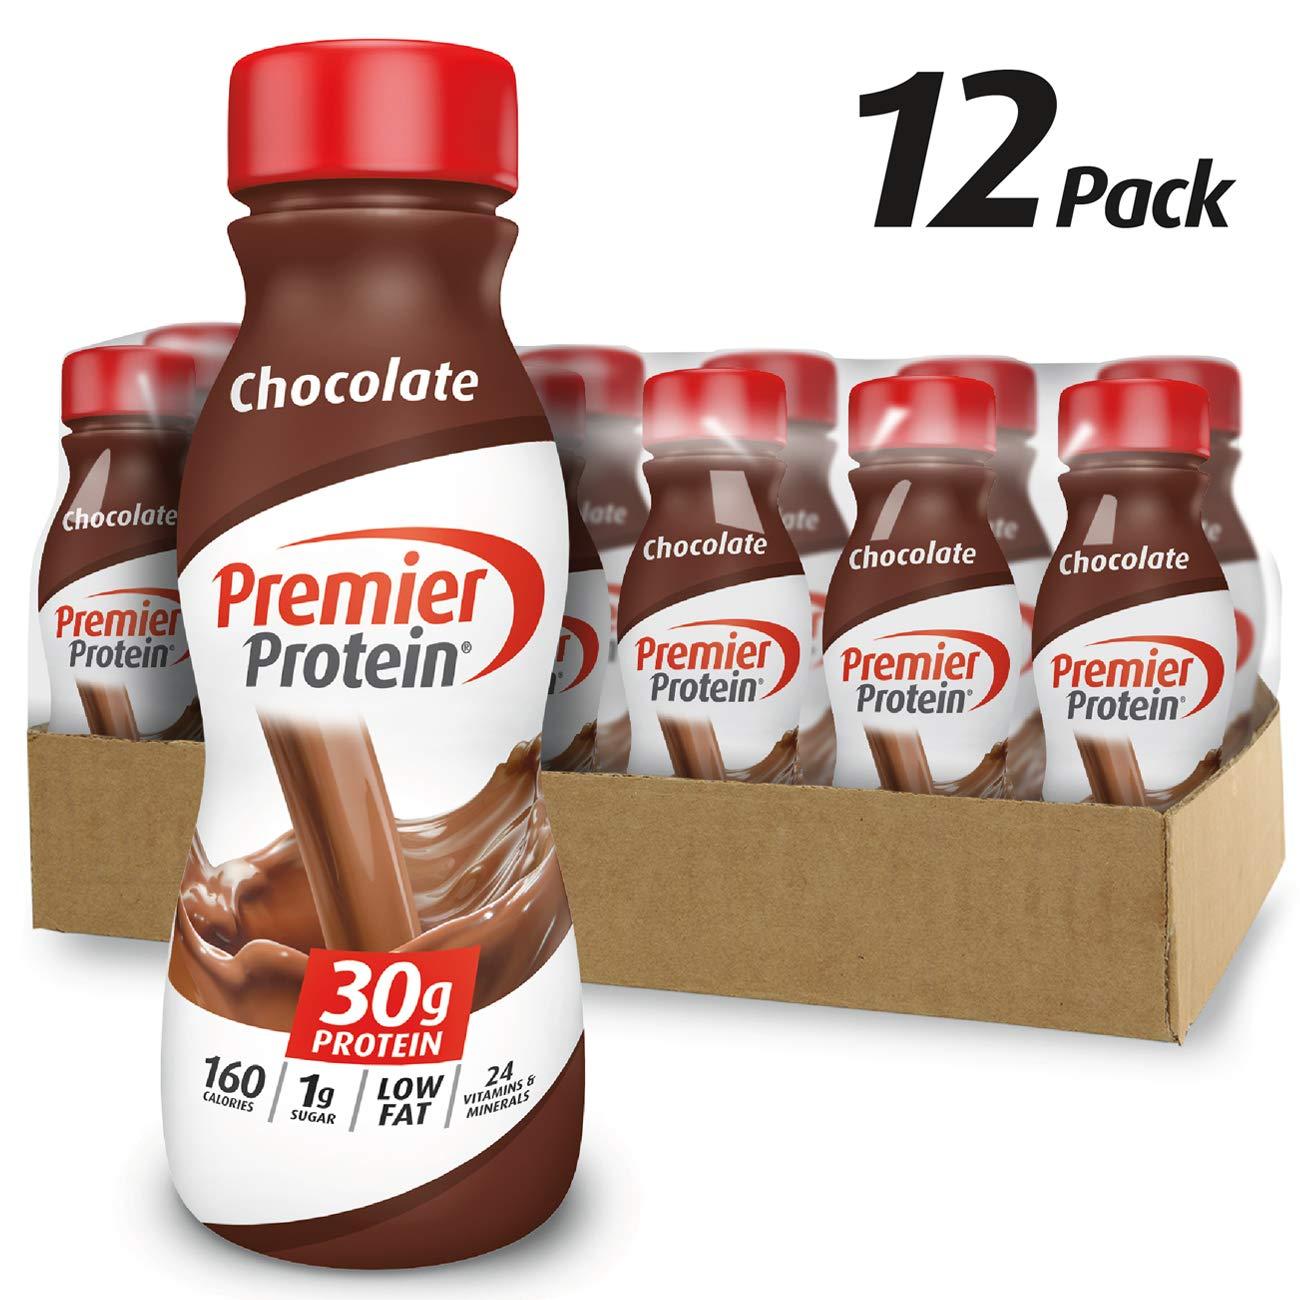 Premier Protein 30g Protein Shake, Chocolate, 11.5 fl oz Shake, (12 count)